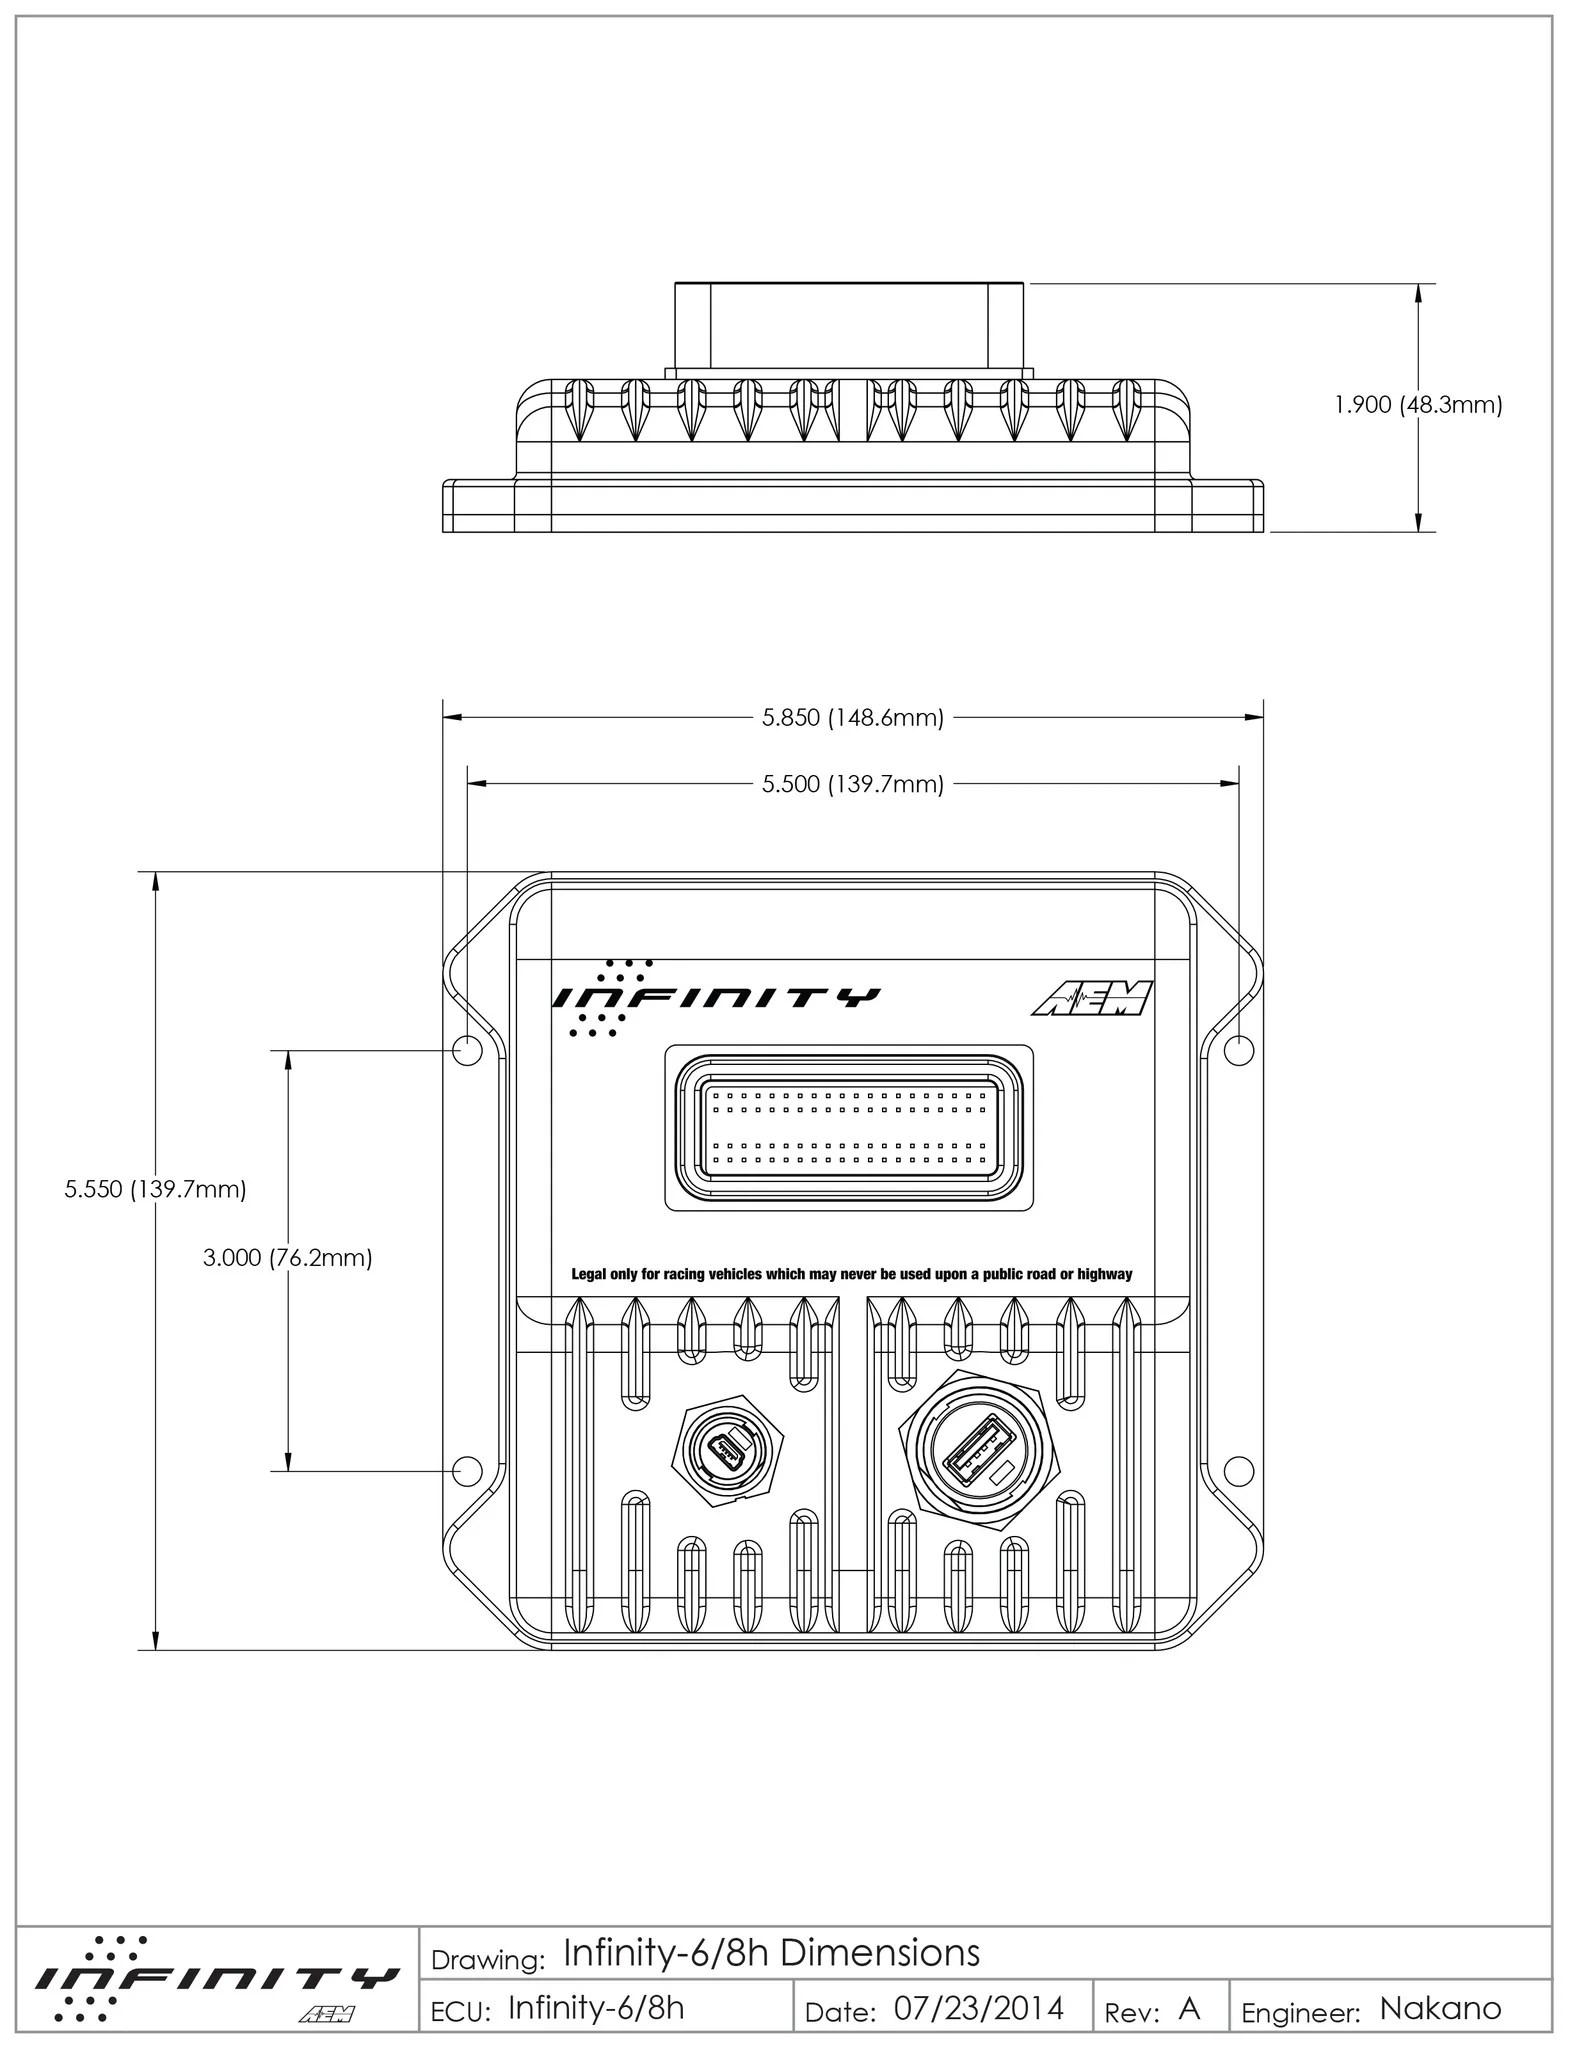 infinity 3 5 engine diagram simple wiring diagram impala 3 8 engine diagram 2002 nissan 3 [ 1570 x 2048 Pixel ]